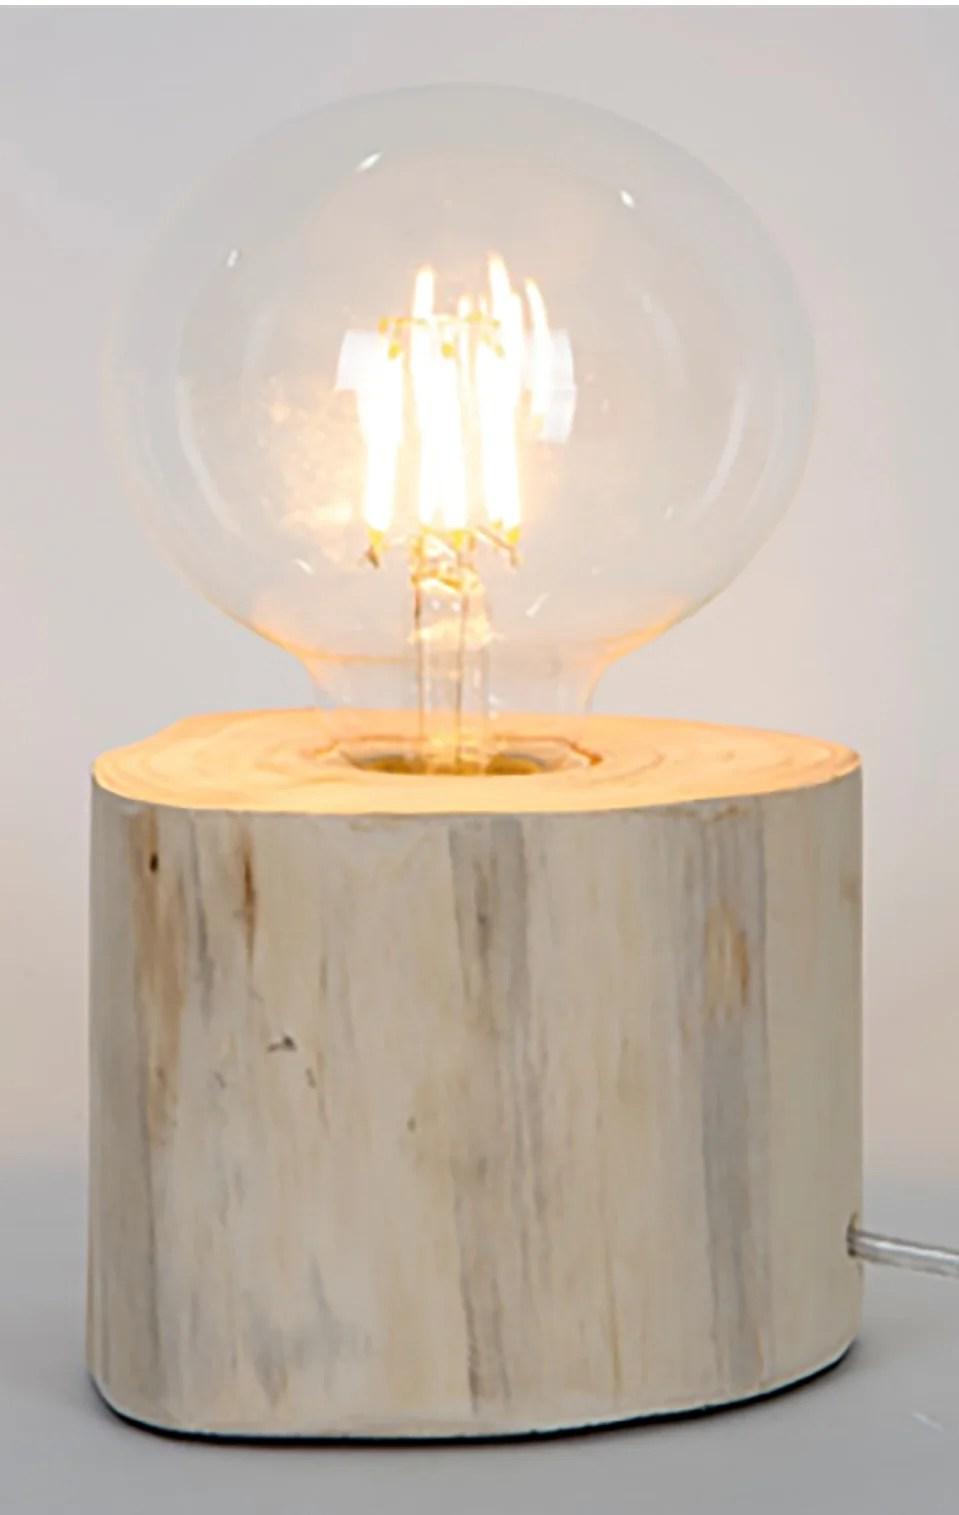 Lampe Charme Romantique Bois Sampa Helios Pam Leroy Merlin